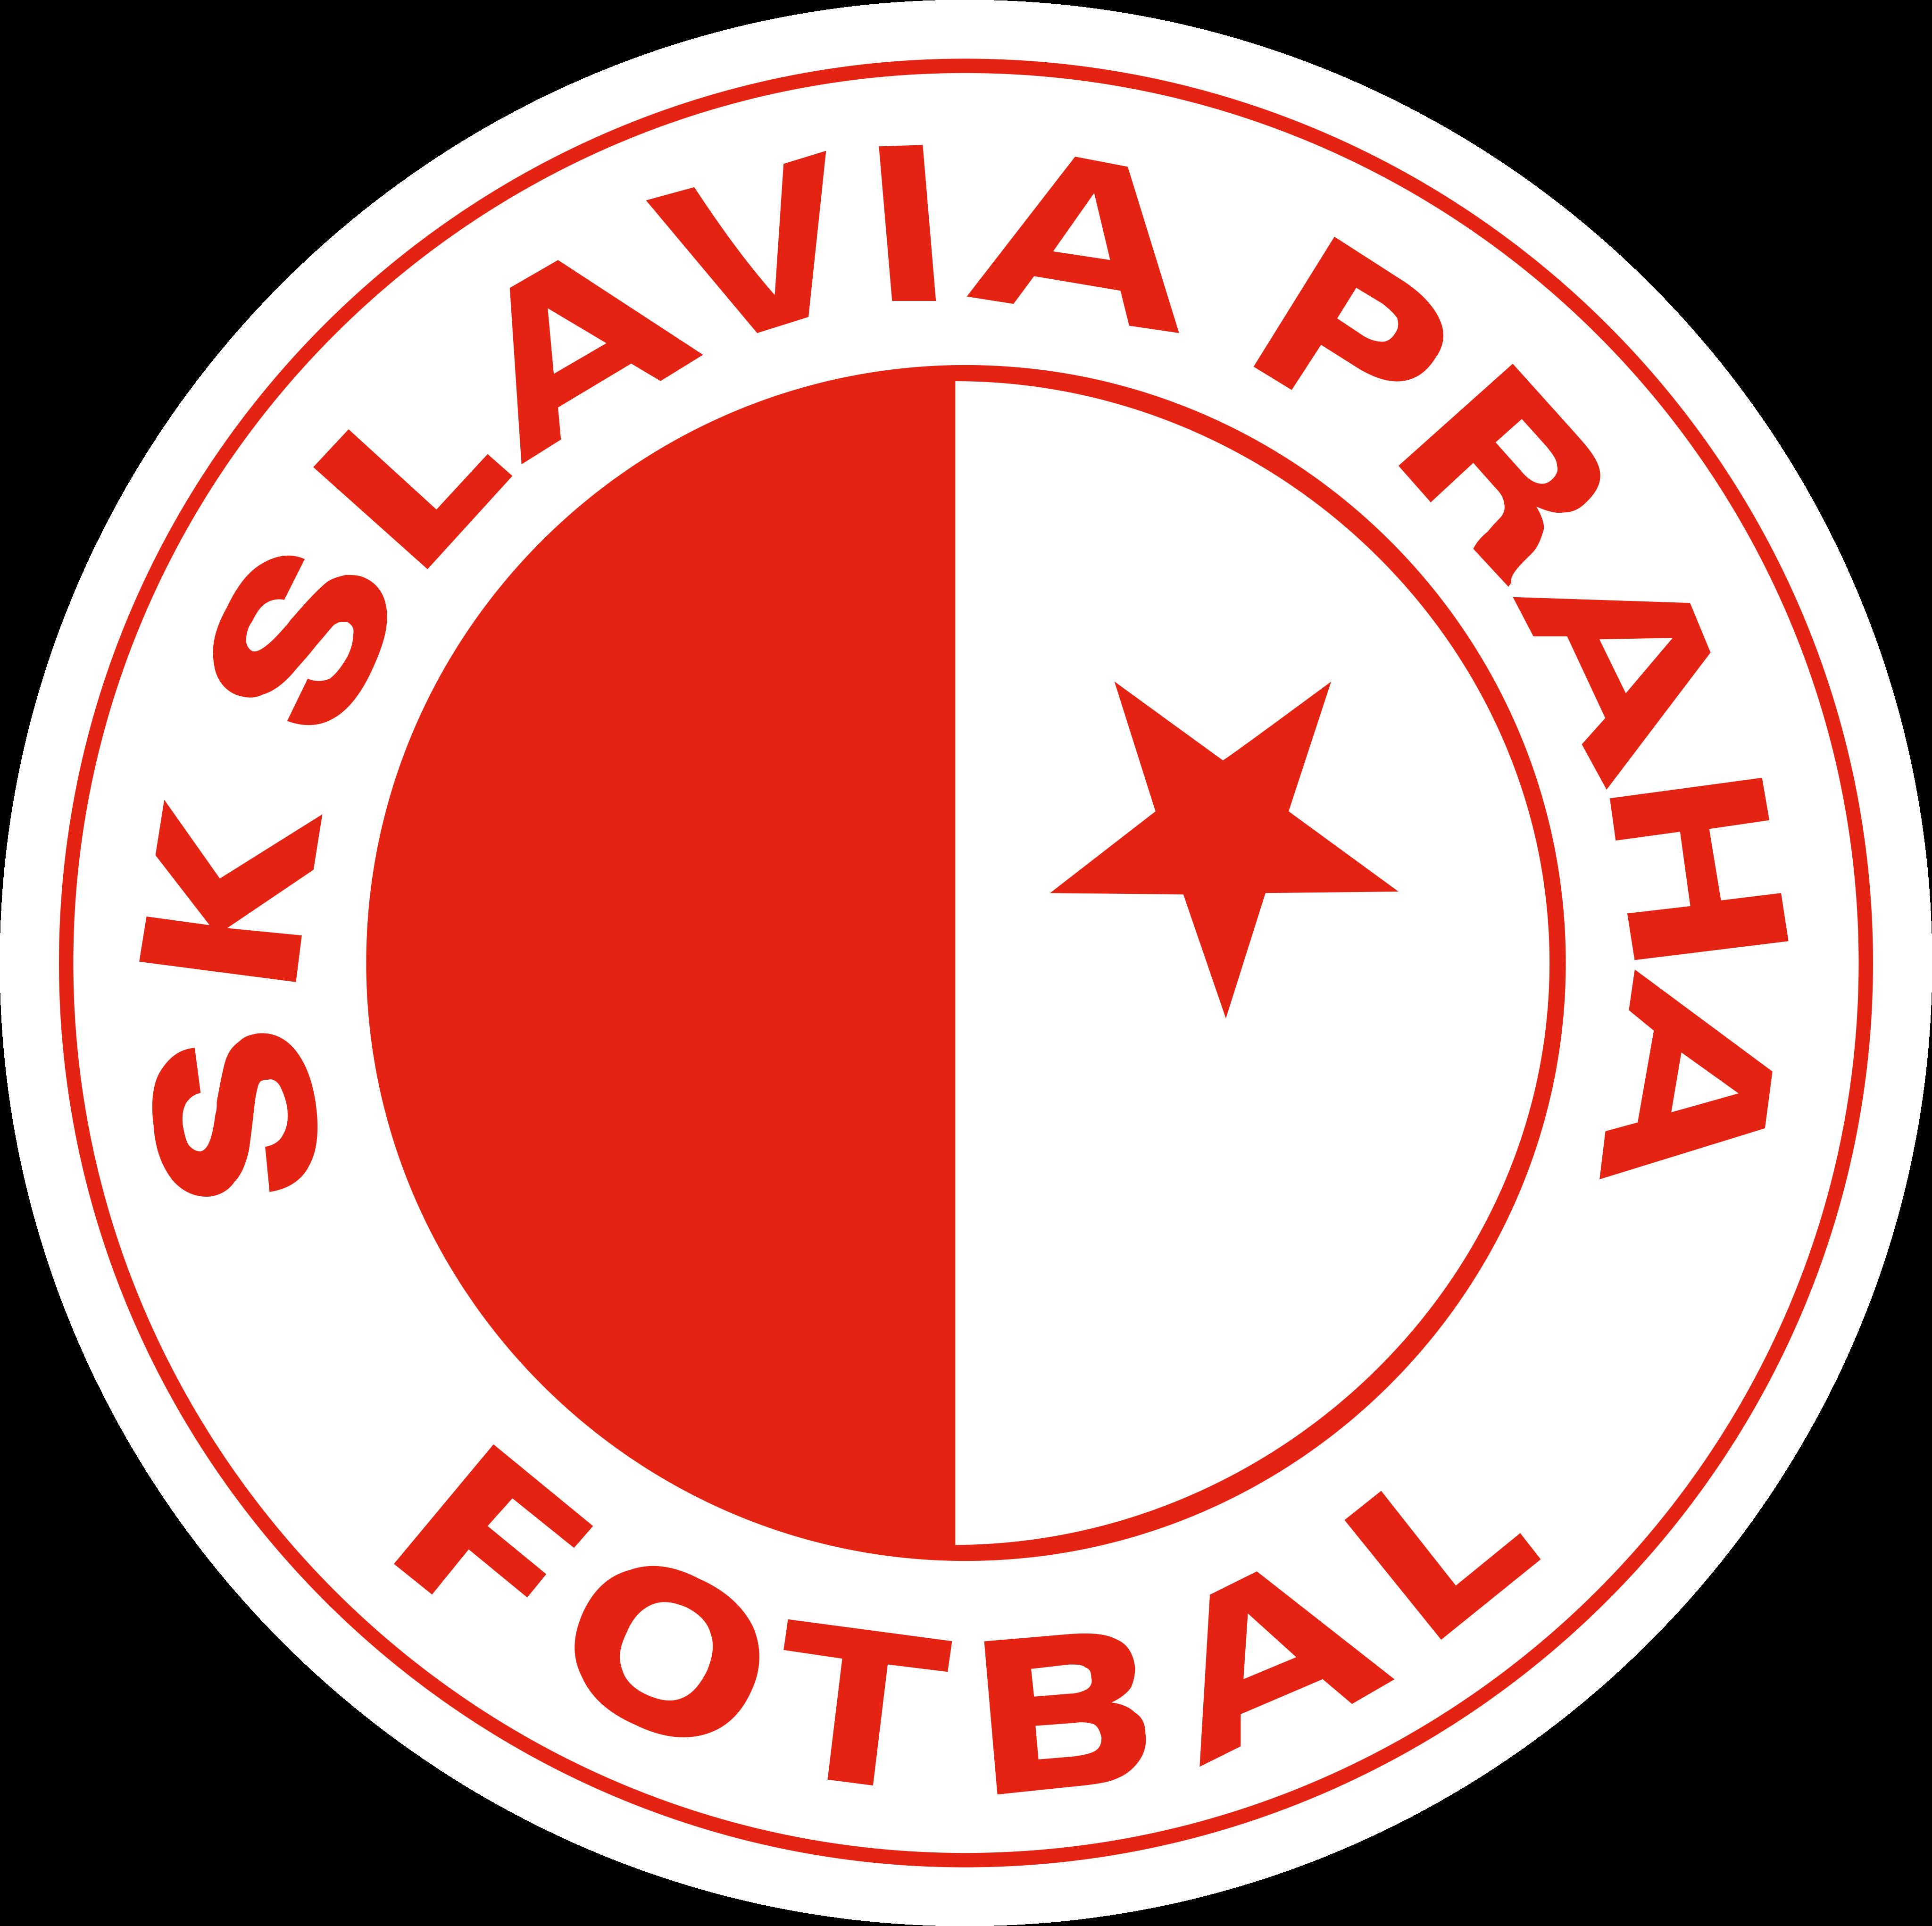 sk slavia praha logo - SK Slavia Praga Logo - Escudo